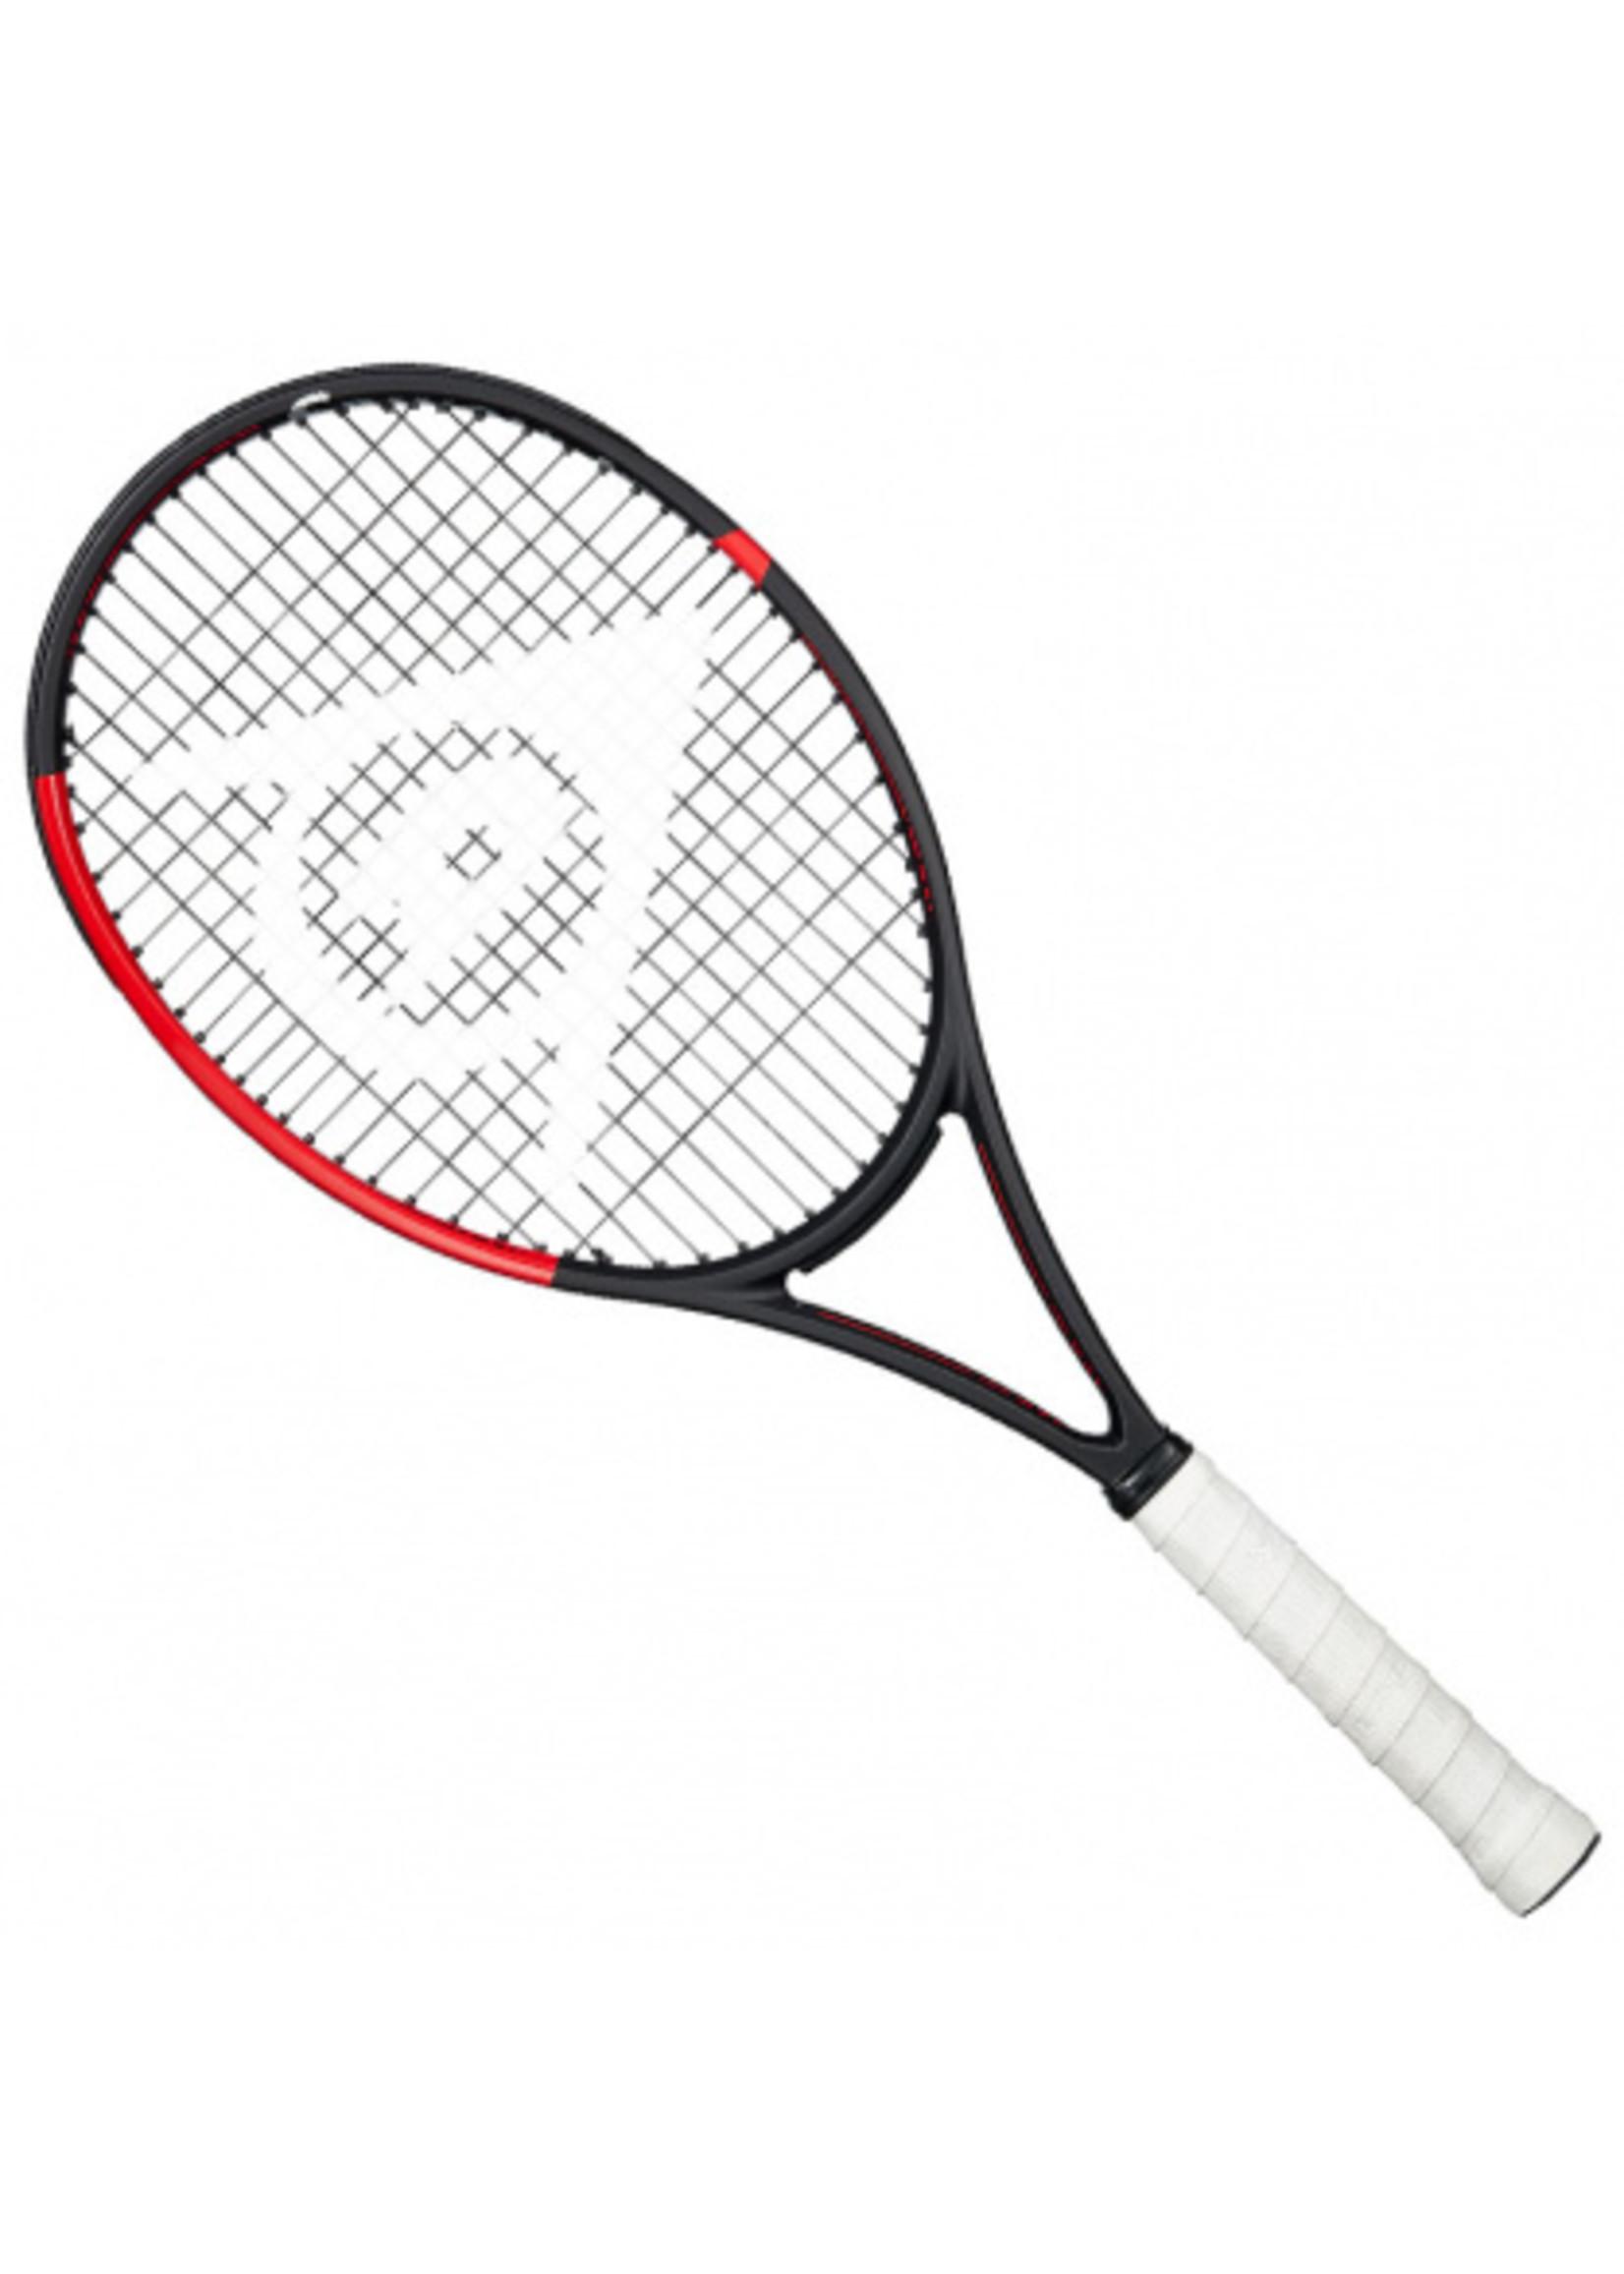 Dunlop Srixon Dunlop Srixon CX 400 Tennis Racket (2019)